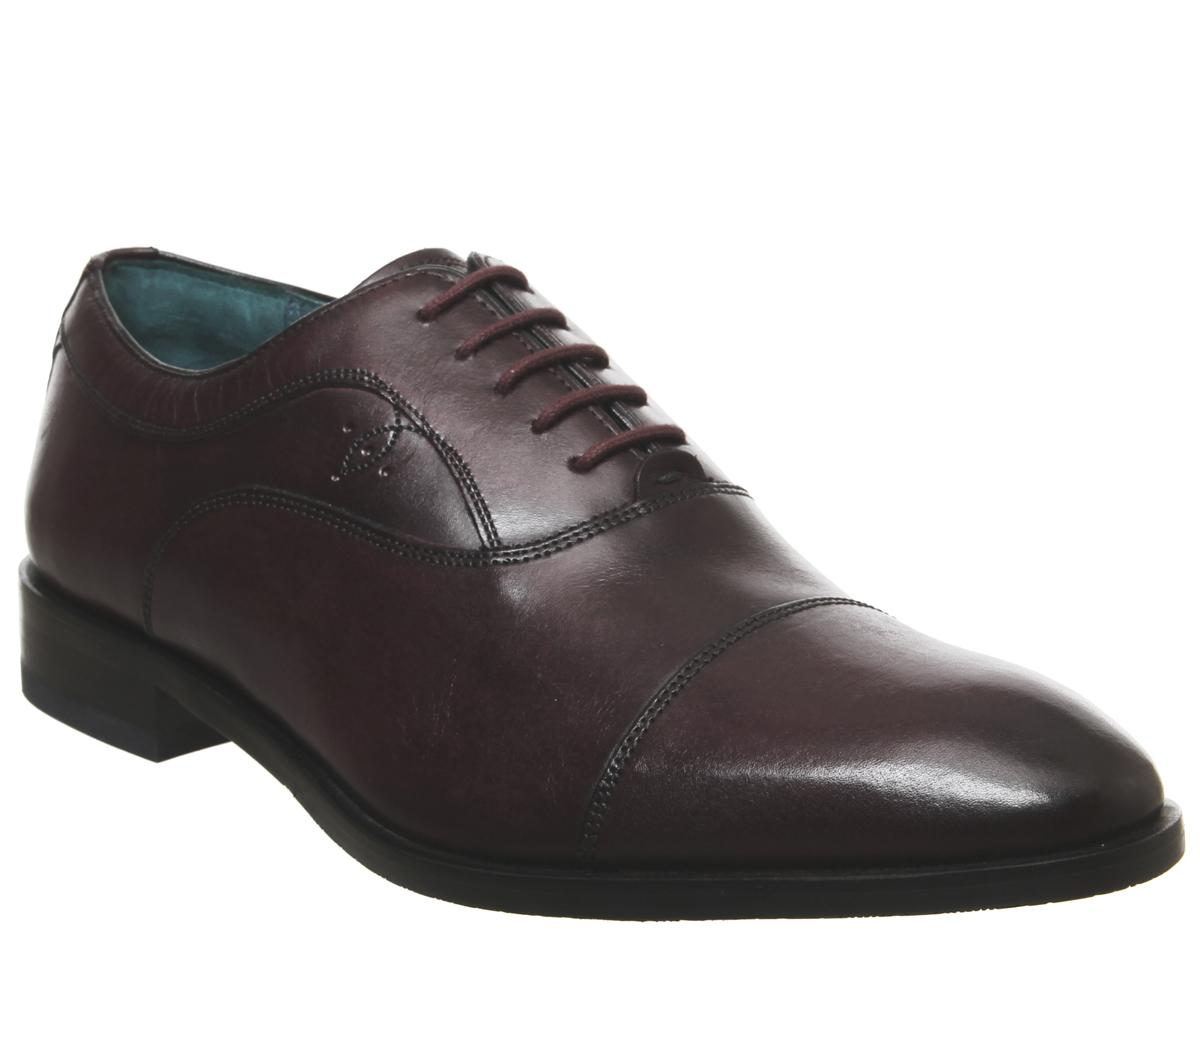 Fually Toe Cap Shoes